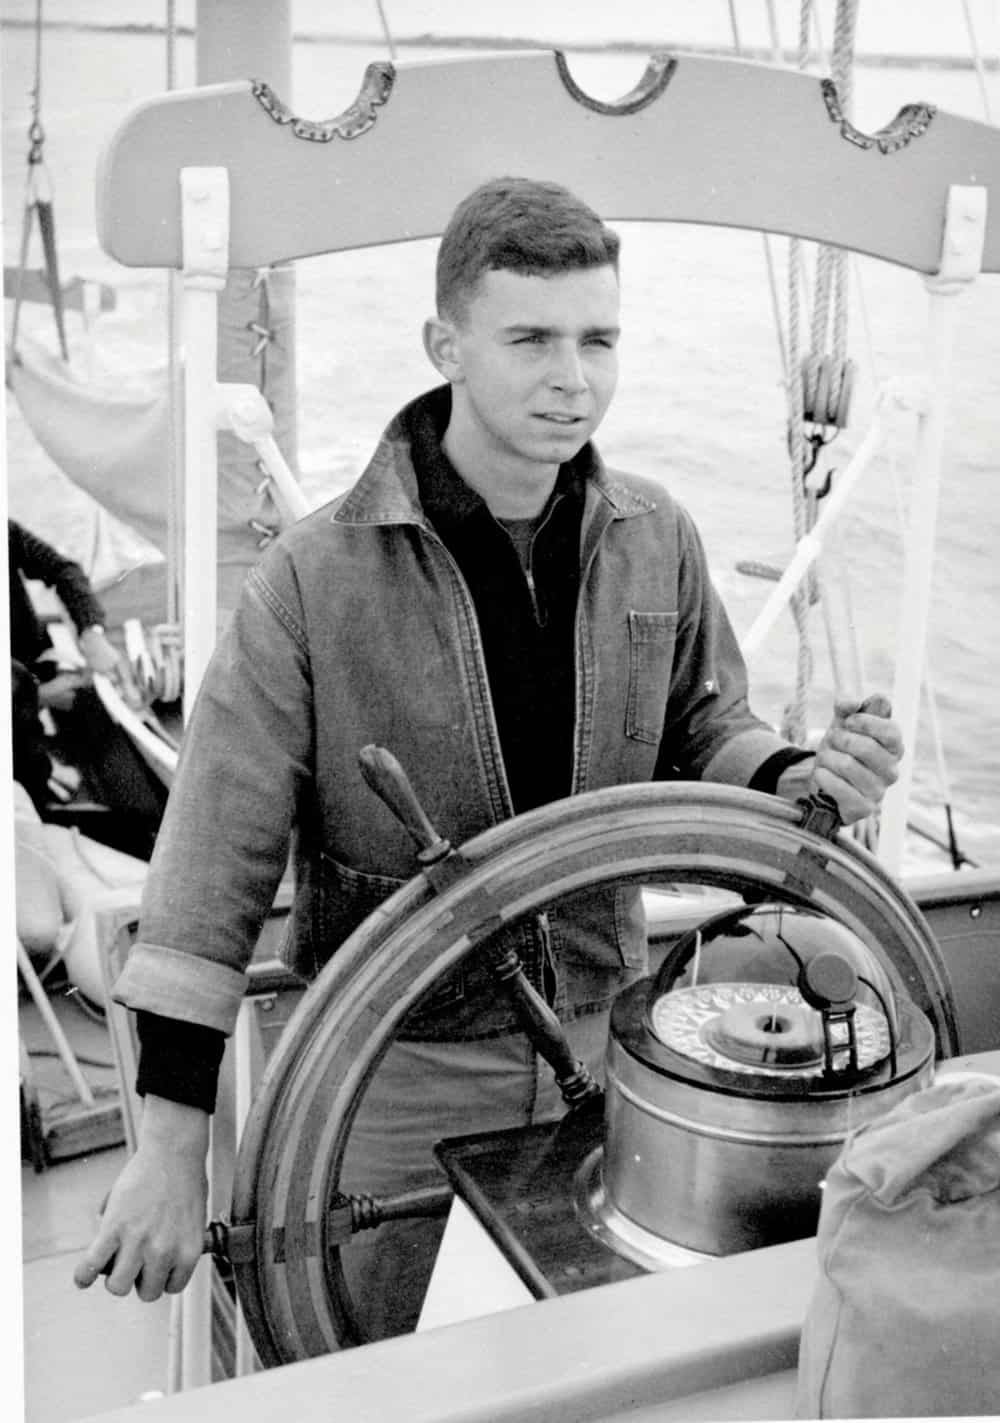 Hecklinger, age 18, at the helm of a 59-foot motorsailor.Photo by Joe Evans.